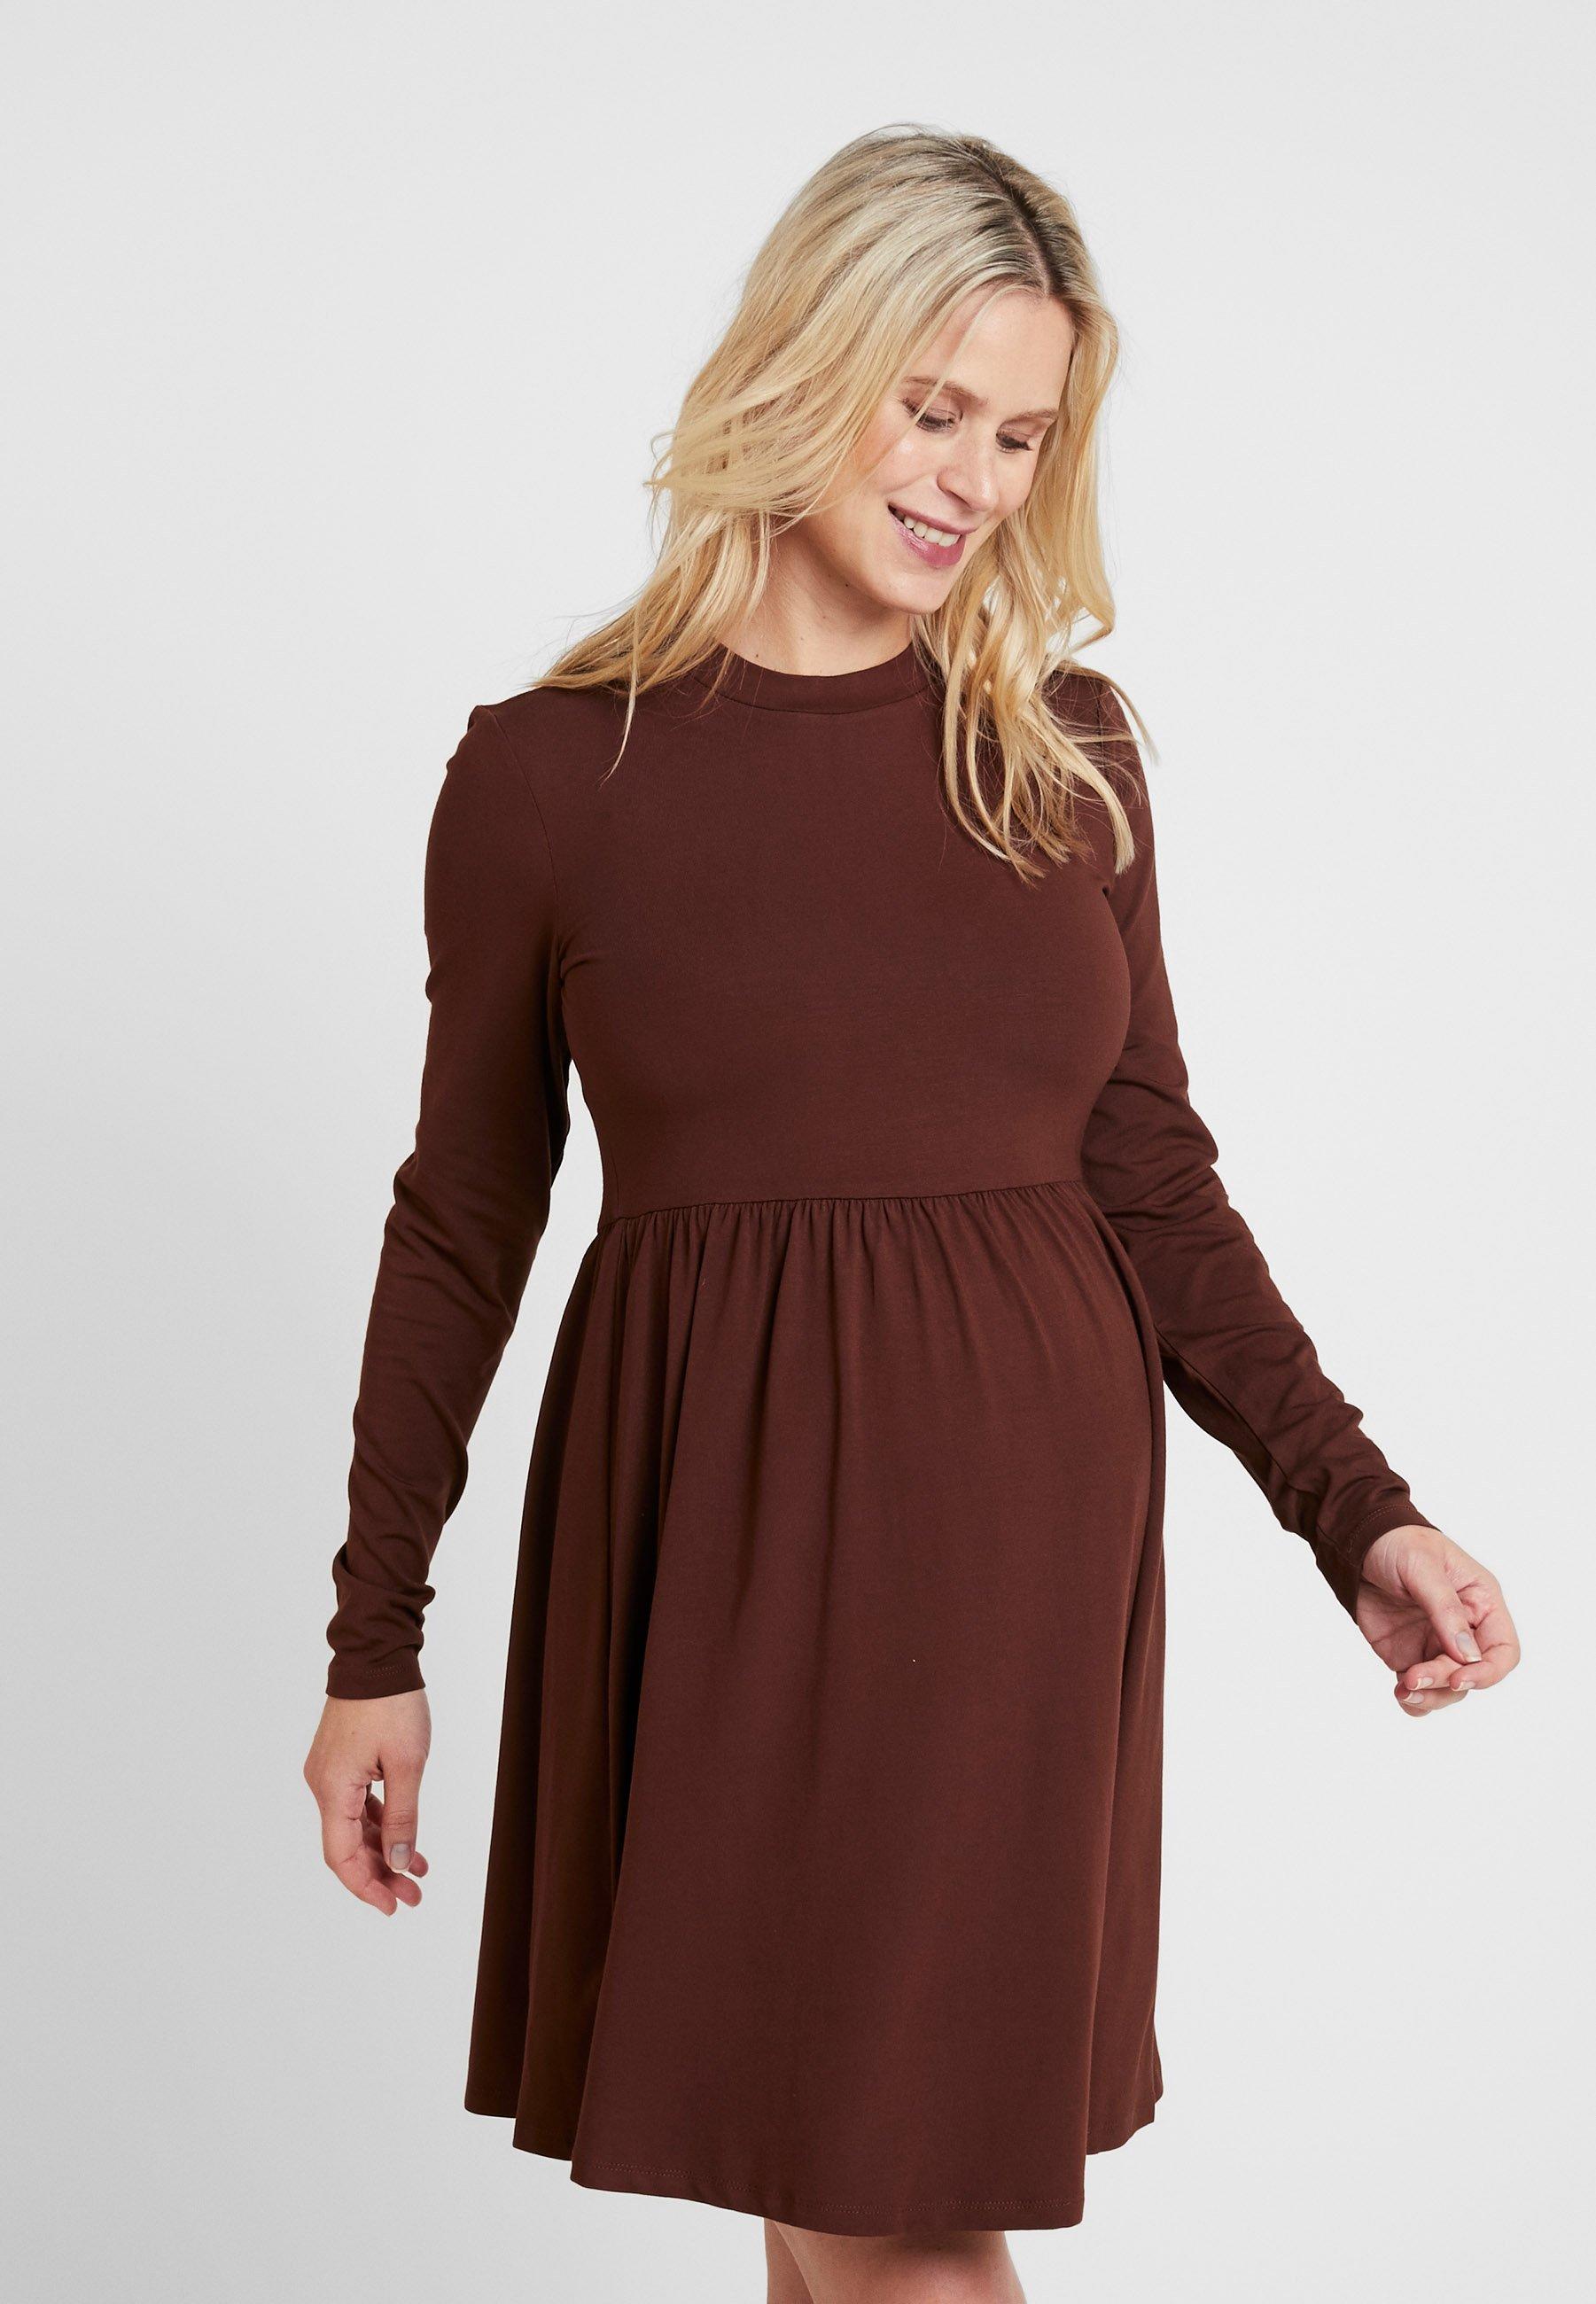 En Gebe RomyRobe Jersey Brown Dress qzVMpGSU